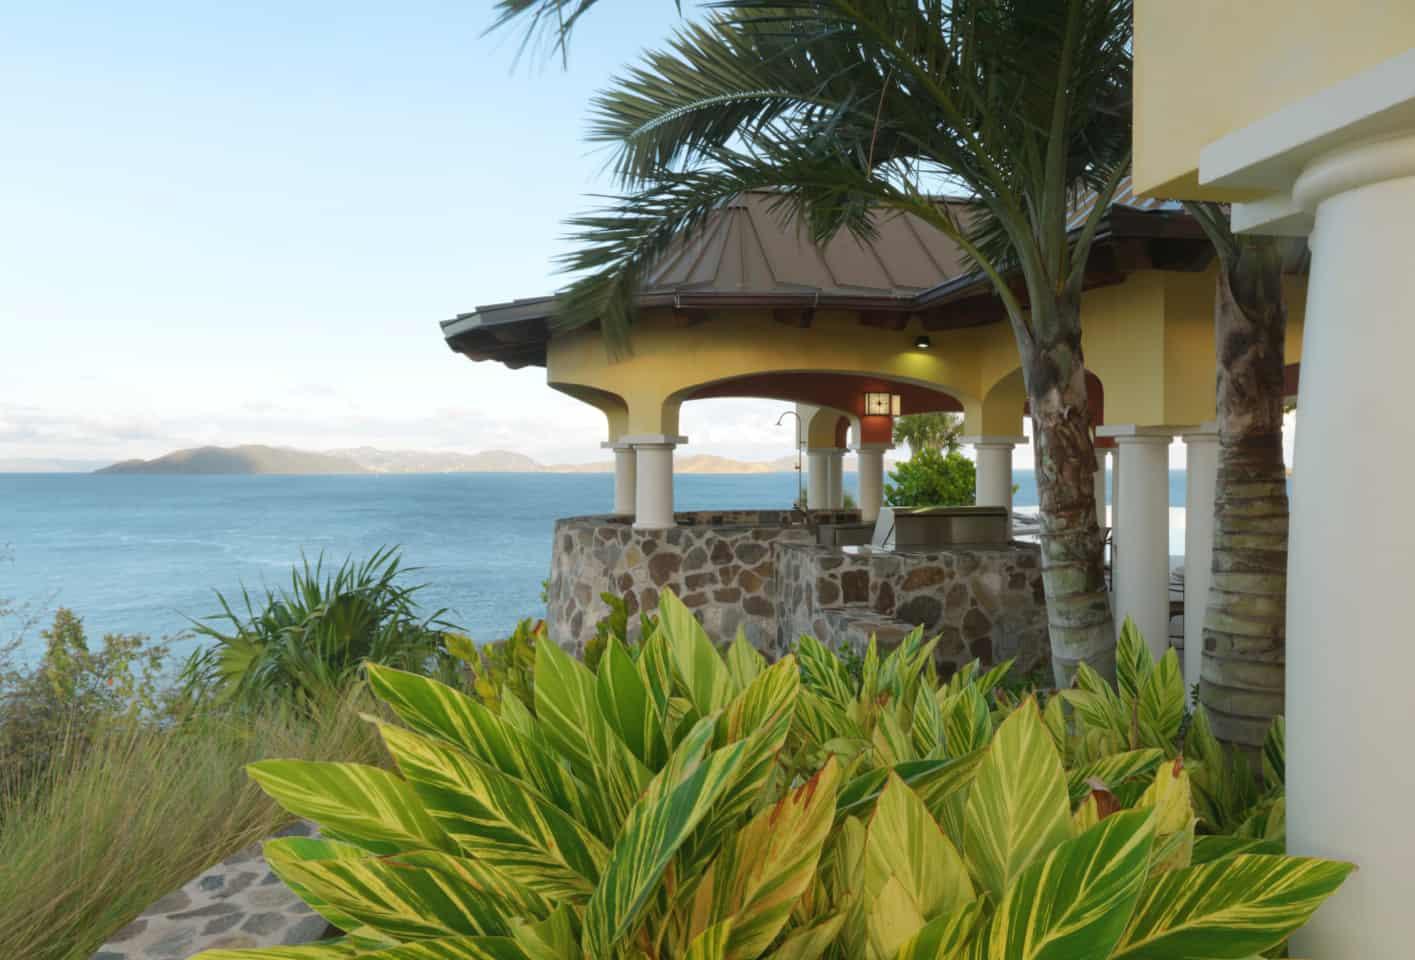 JMMDS_British-Virgin-Islands-landscape_overlook